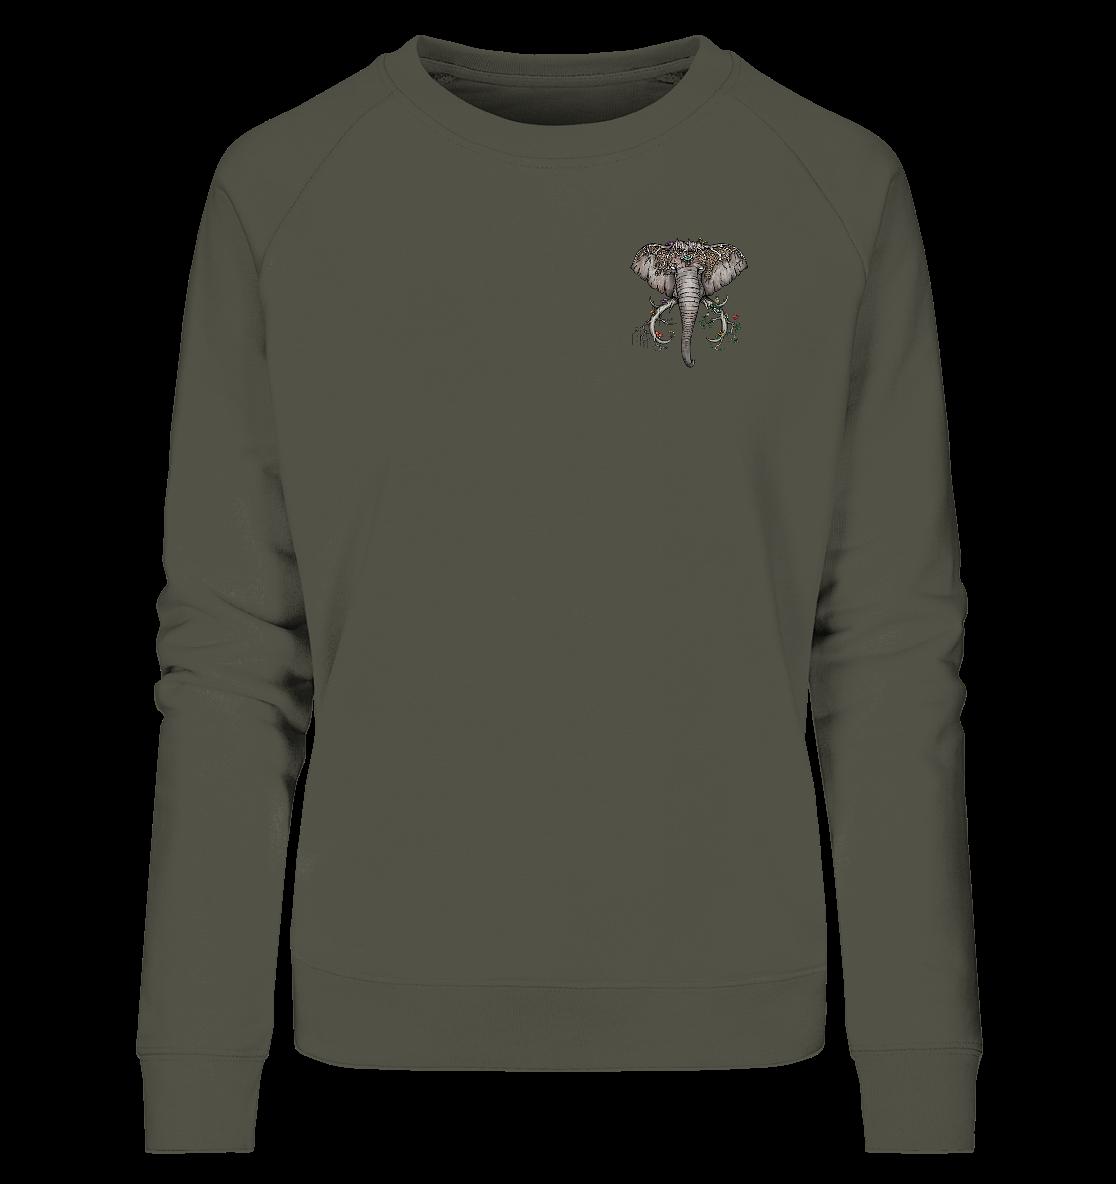 front-ladies-organic-sweatshirt-545348-1116x-1.png